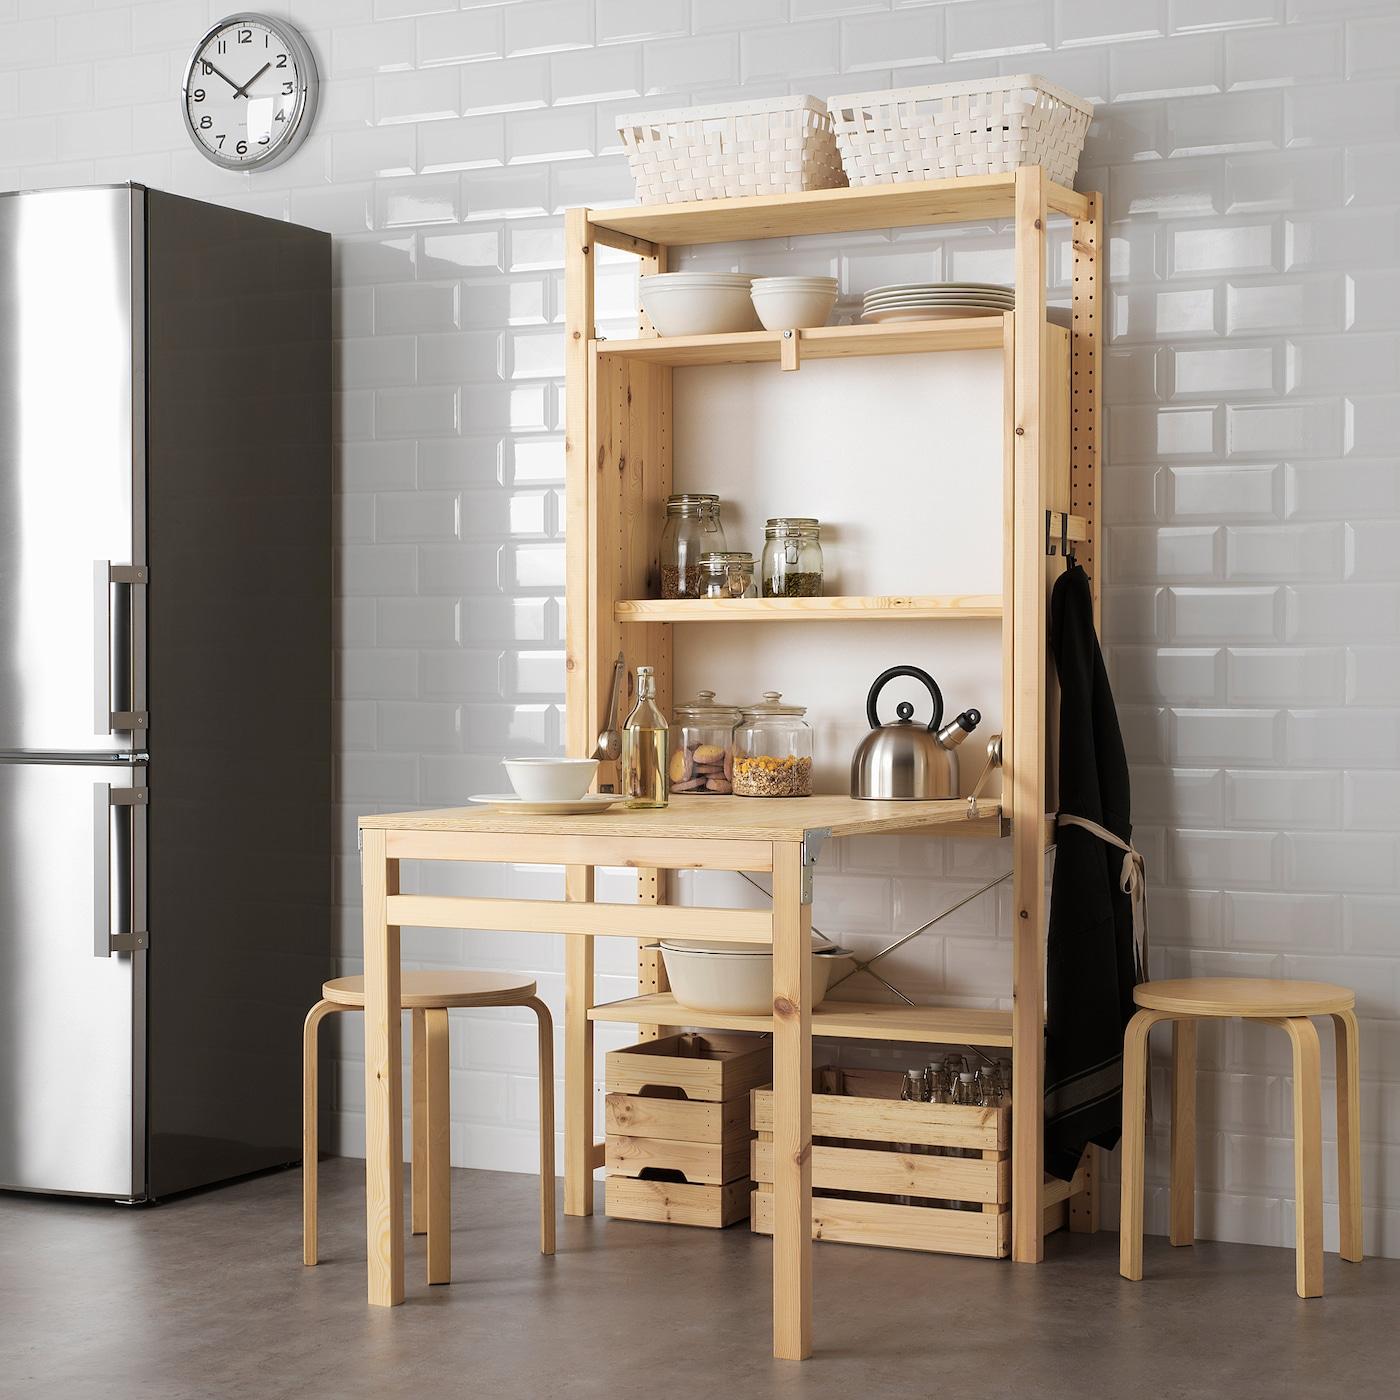 Ongekend IVAR Opberger met klaptafel, grenen - IKEA KS-39